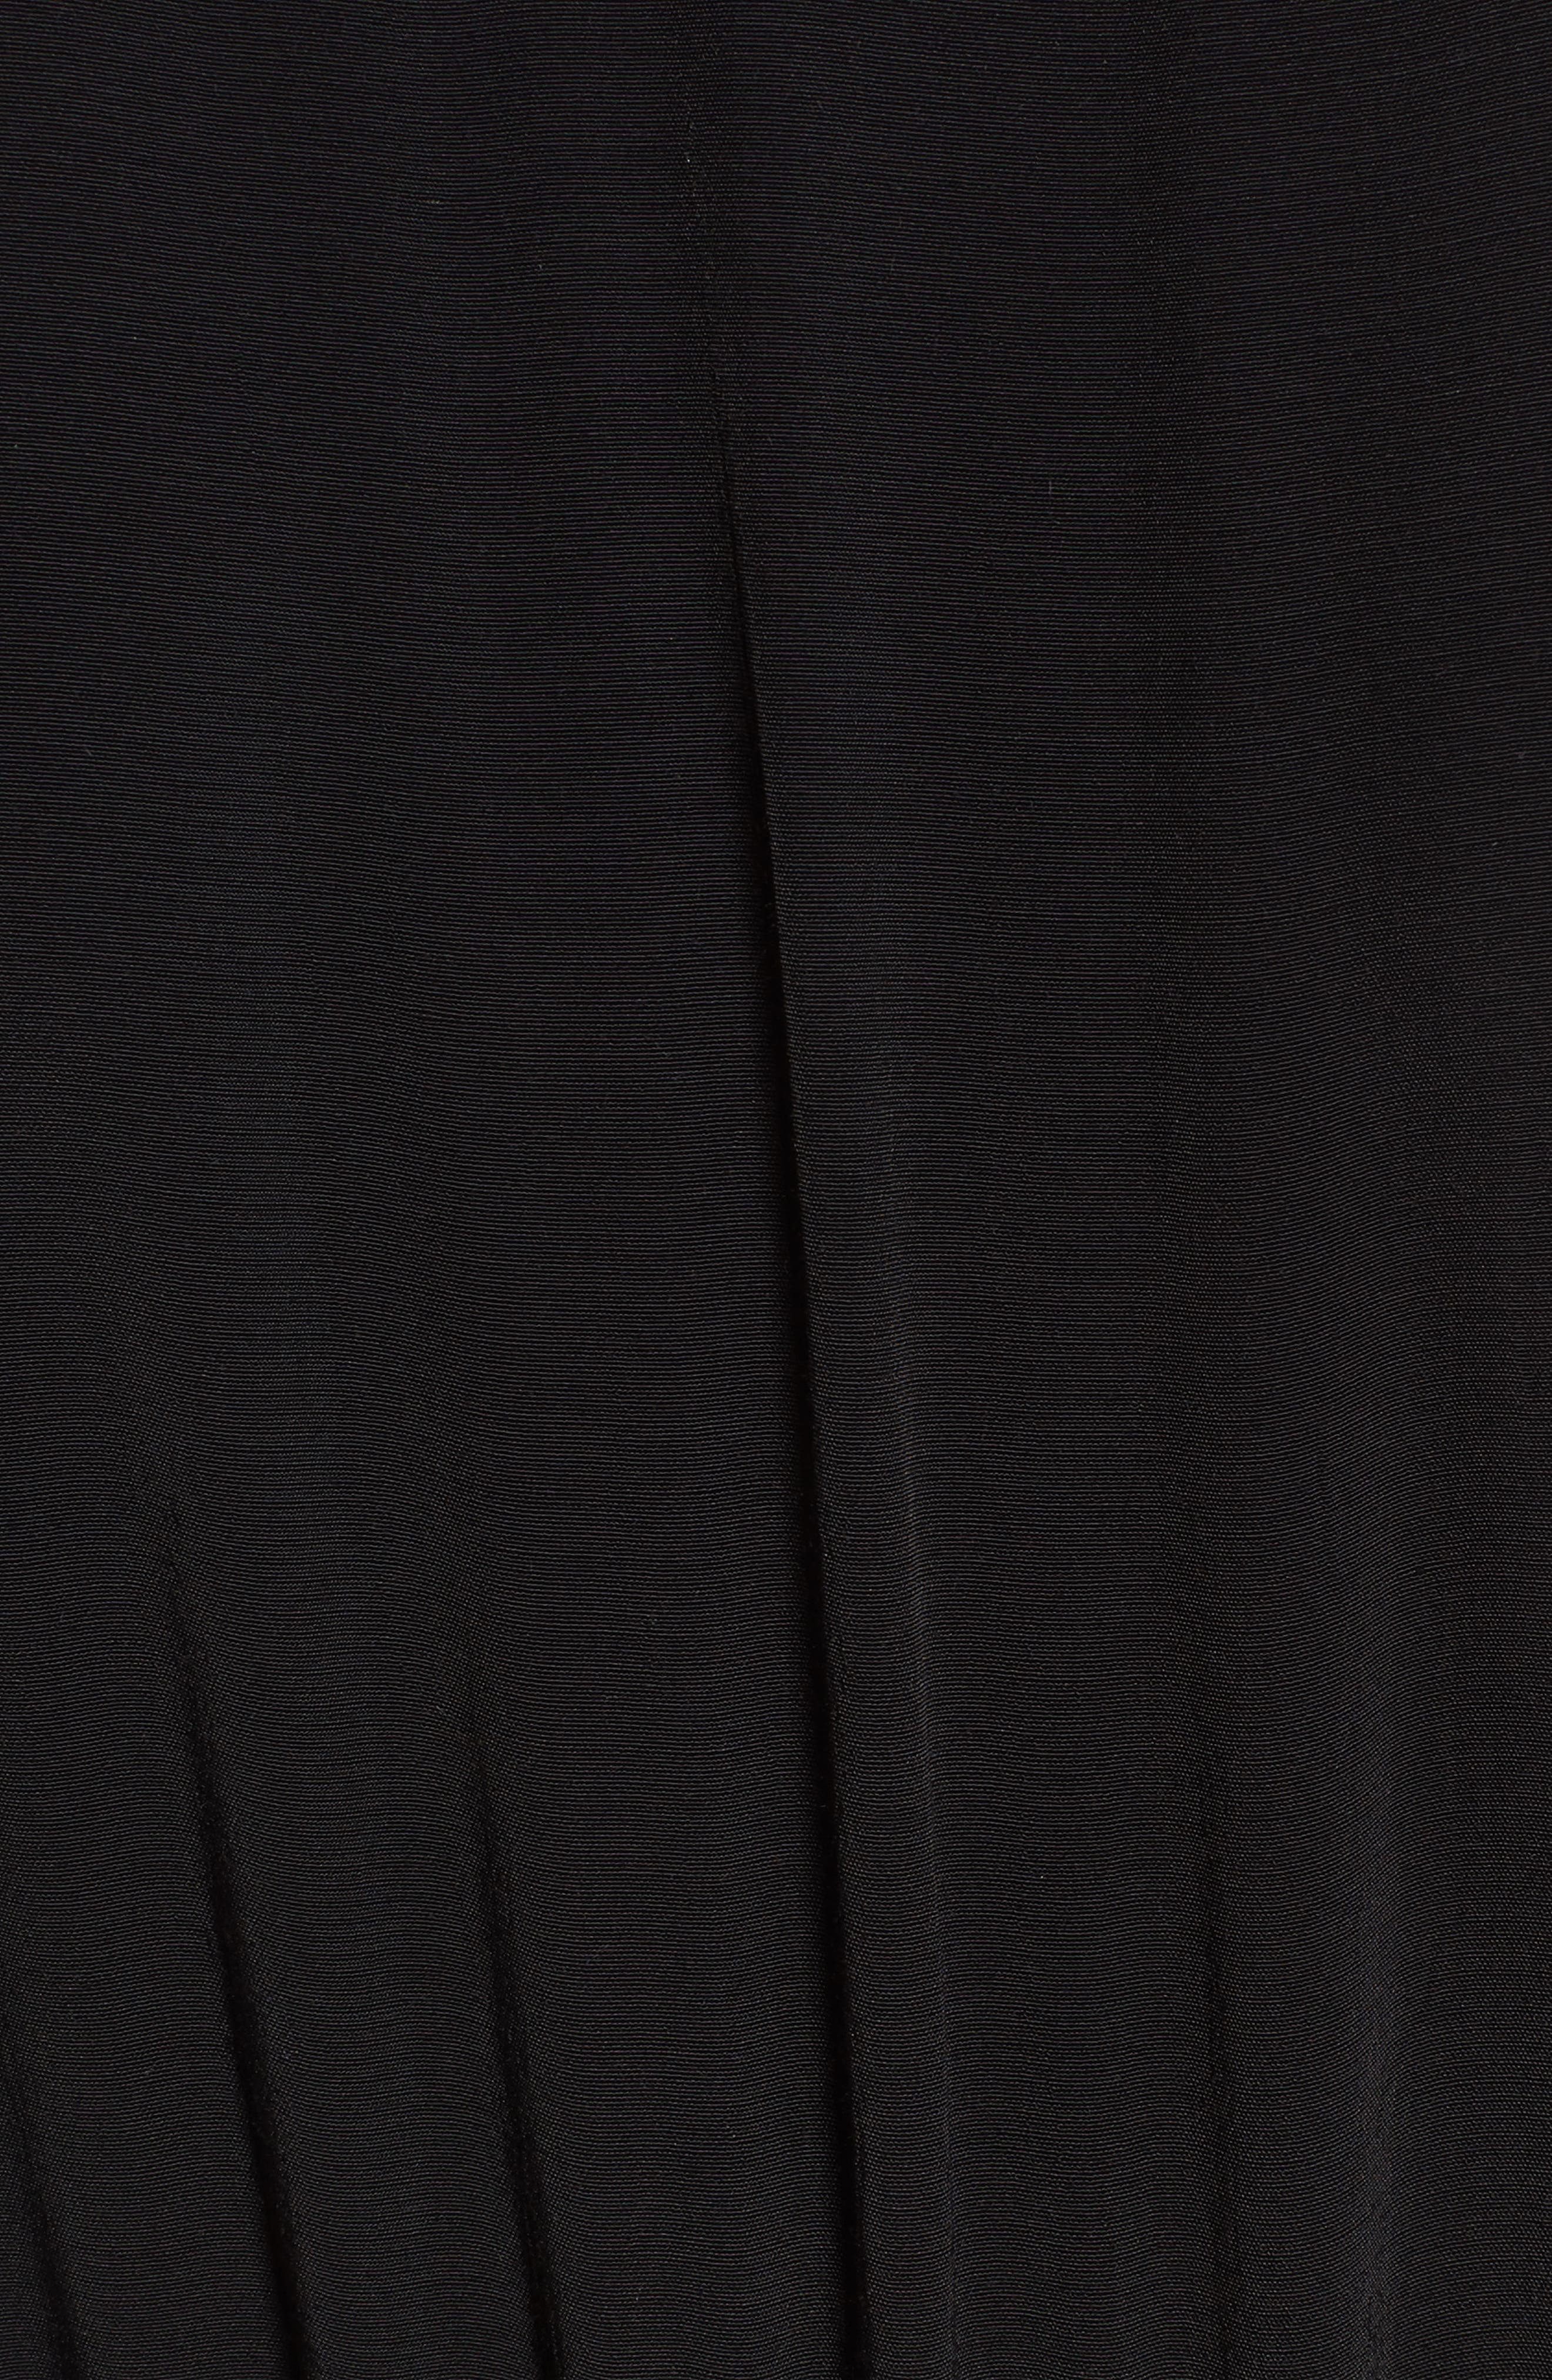 Embroidered Midi Dress,                             Alternate thumbnail 5, color,                             001